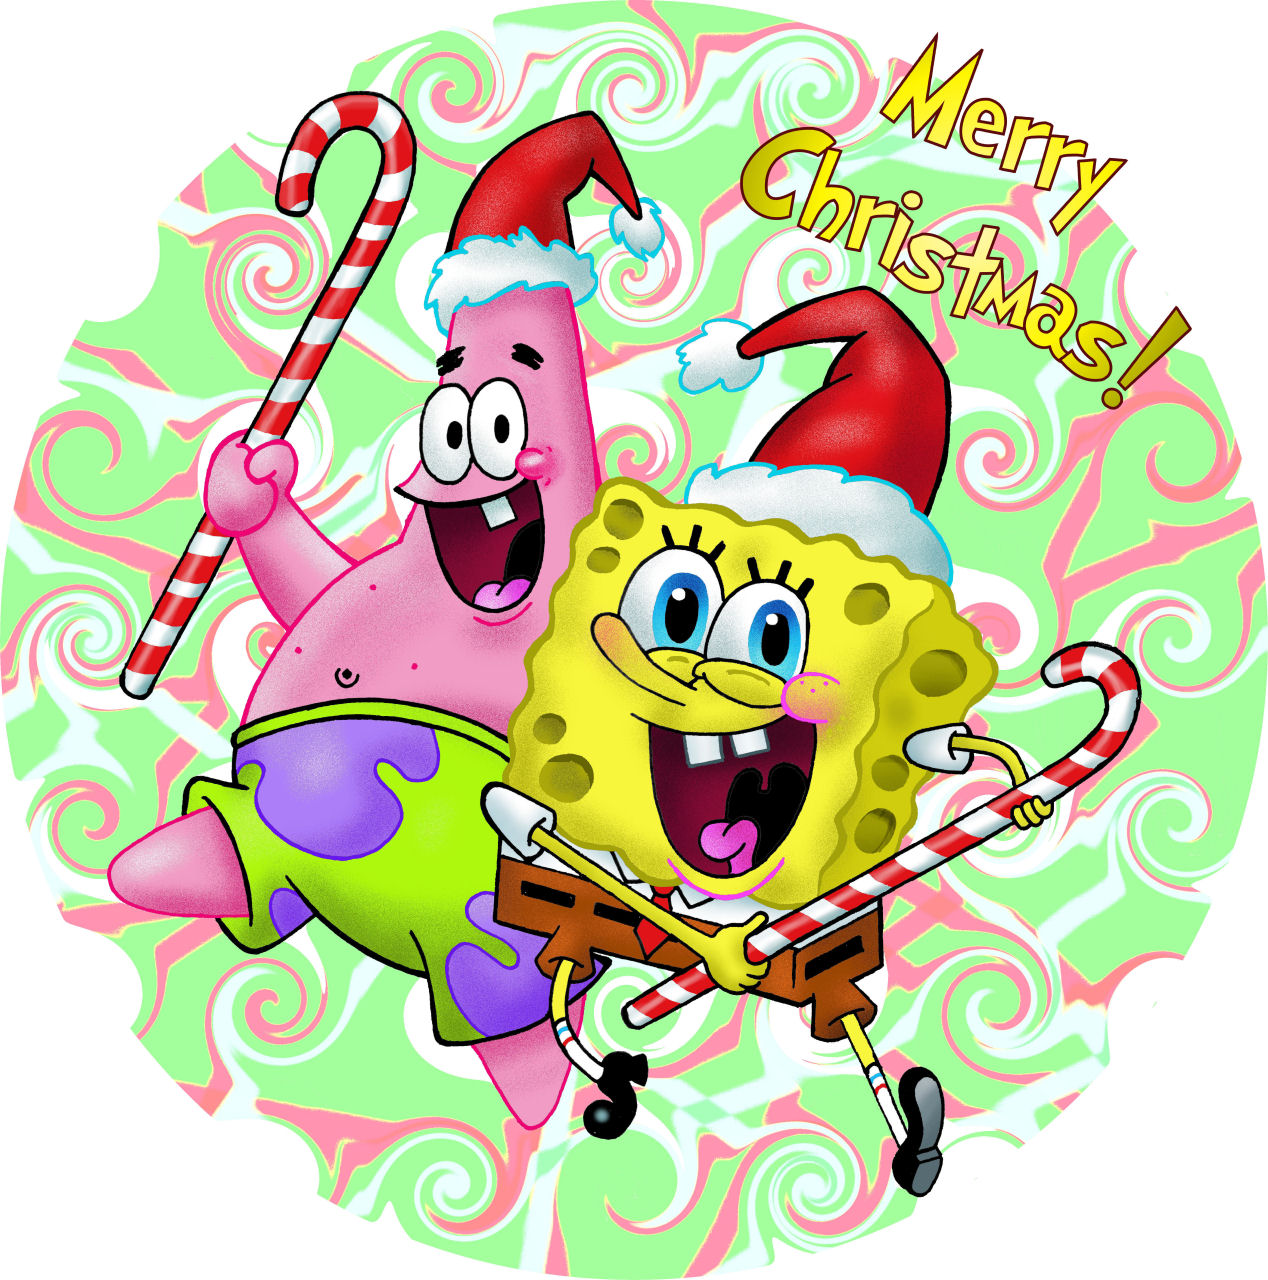 A Spongebob Christmas by gjones1